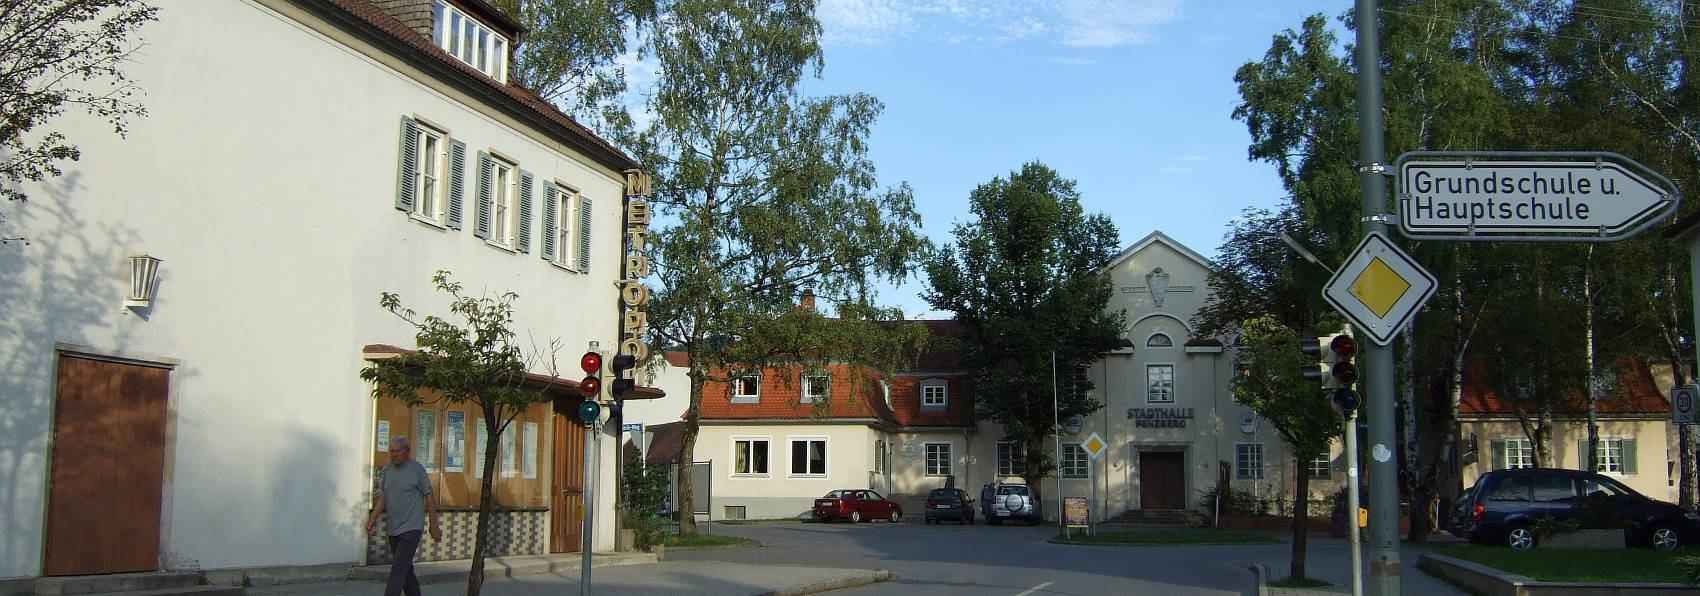 Hotels Pension Zimmer In Penzberg